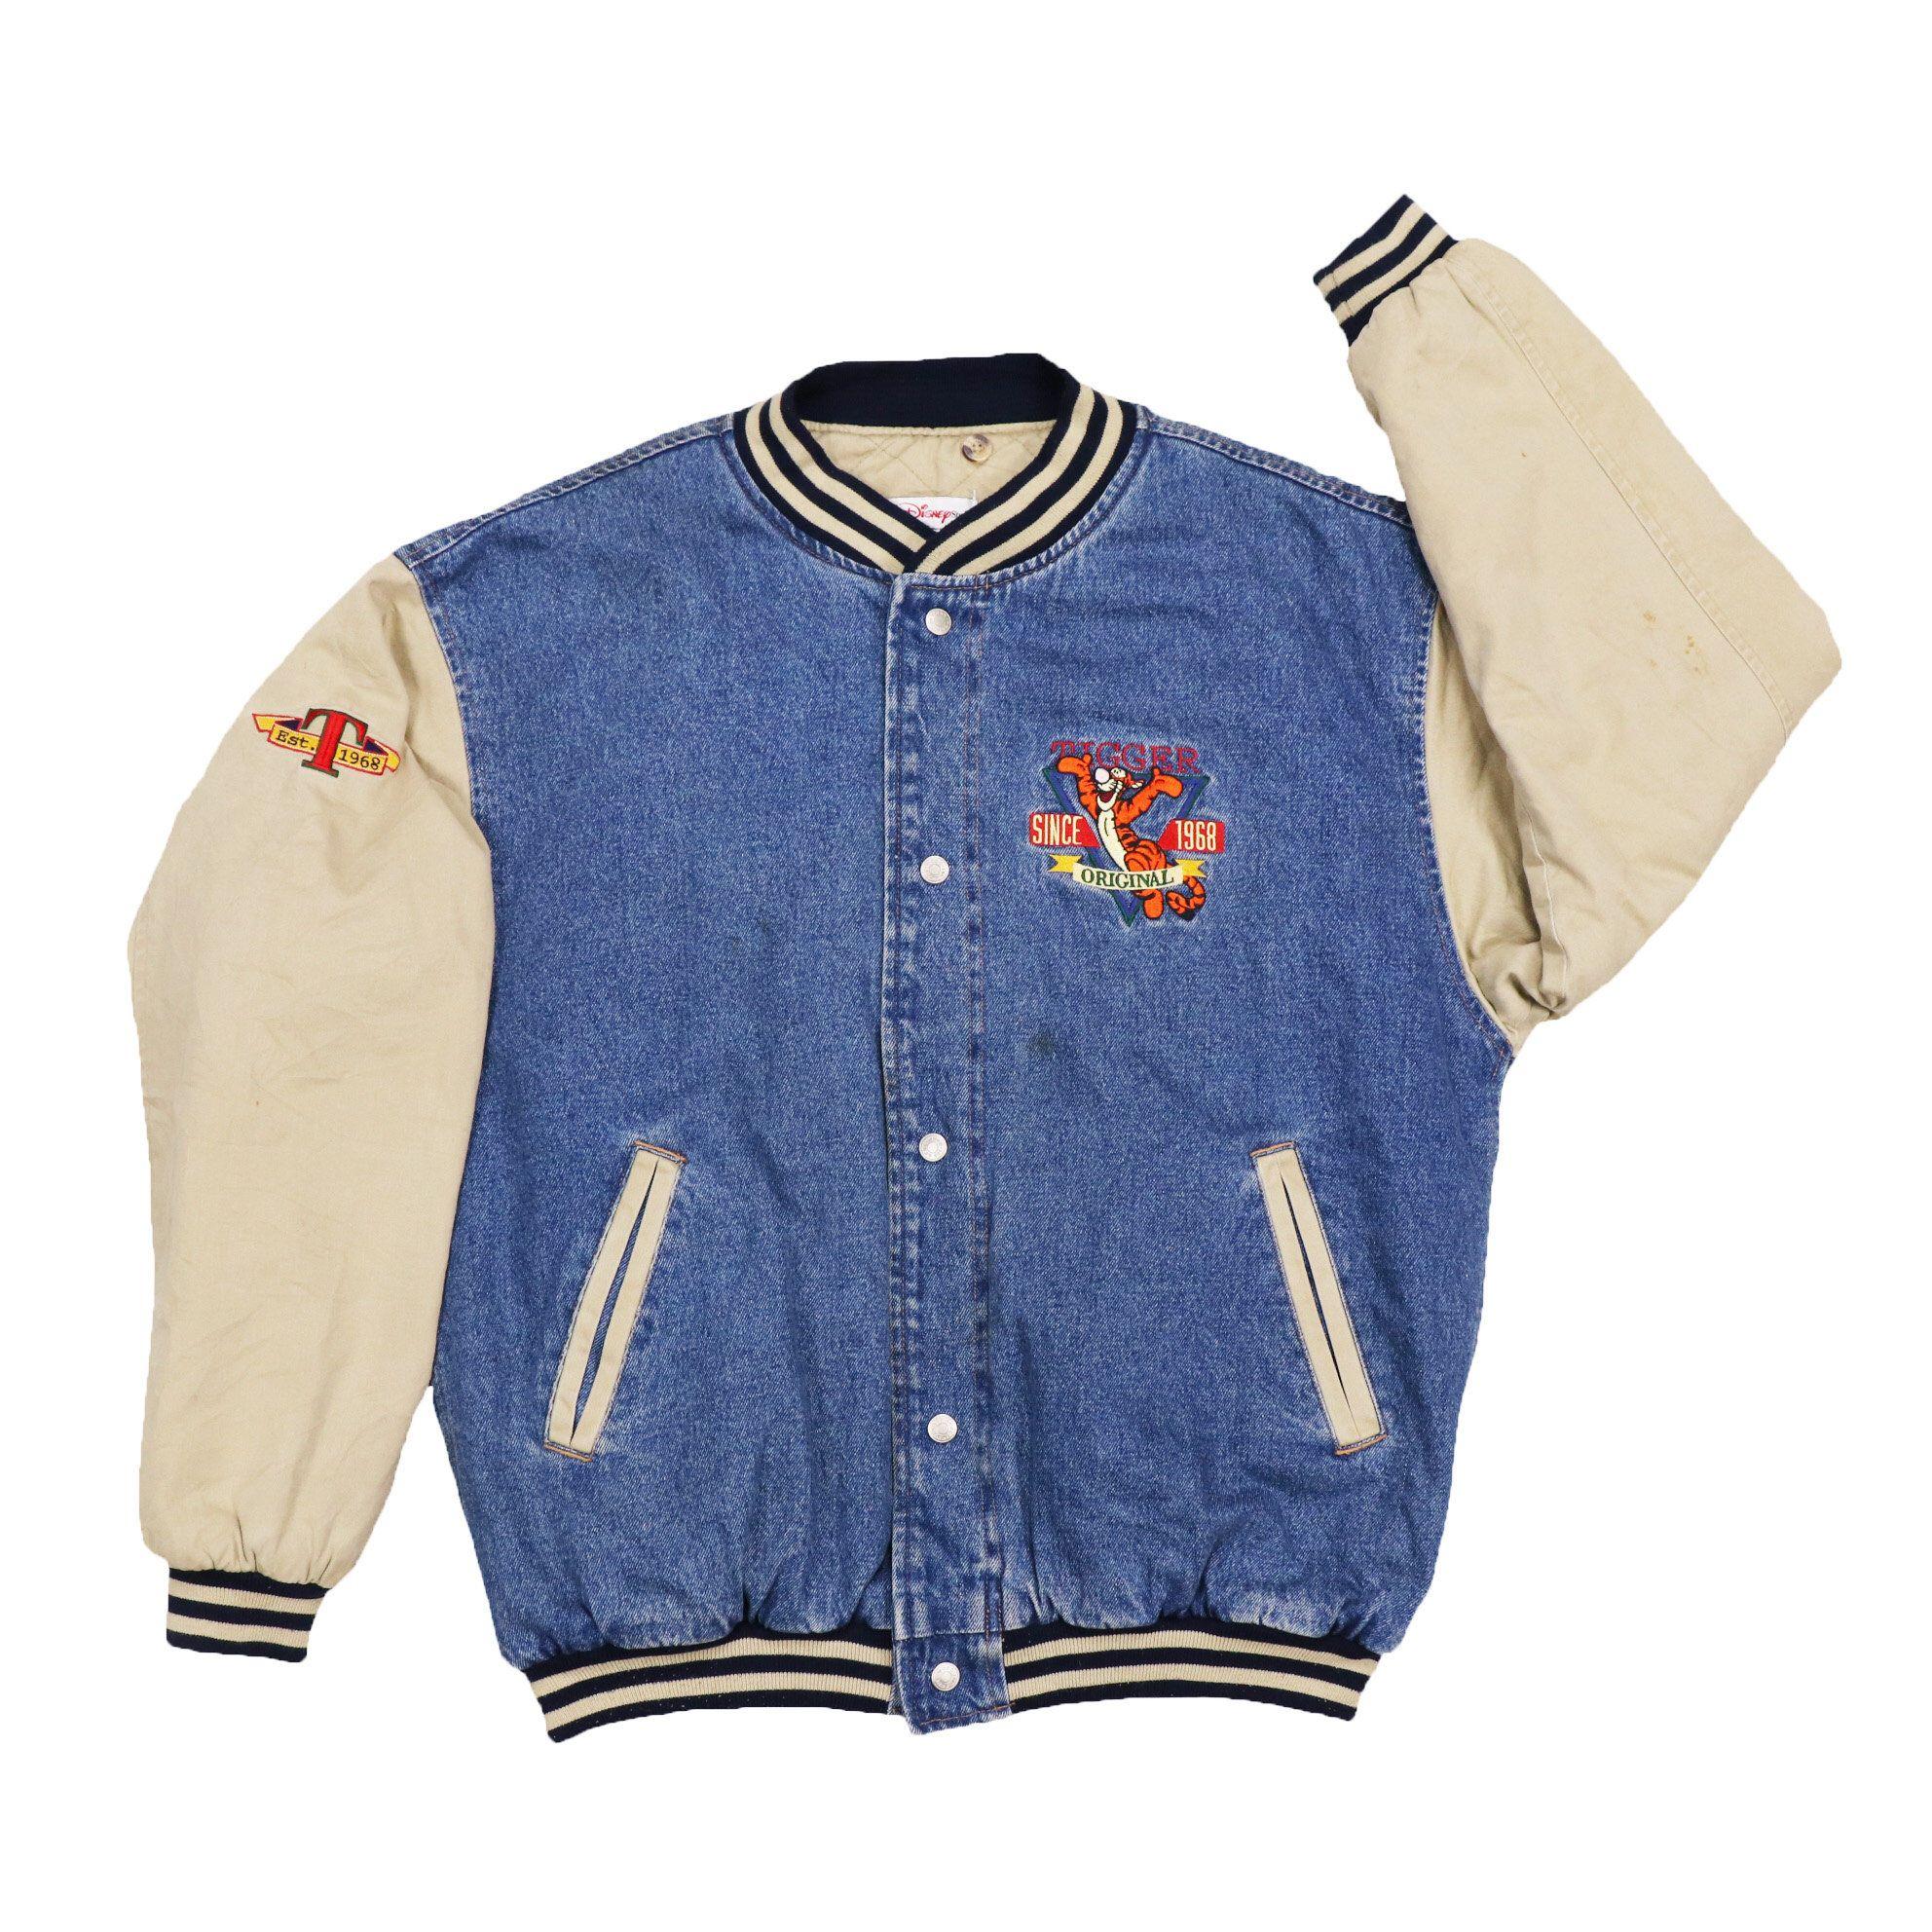 Vintage Disney Store Tigger Varsity Denim Jacket Etsy In 2020 Denim Jacket Jackets Disney Inspired Outfits